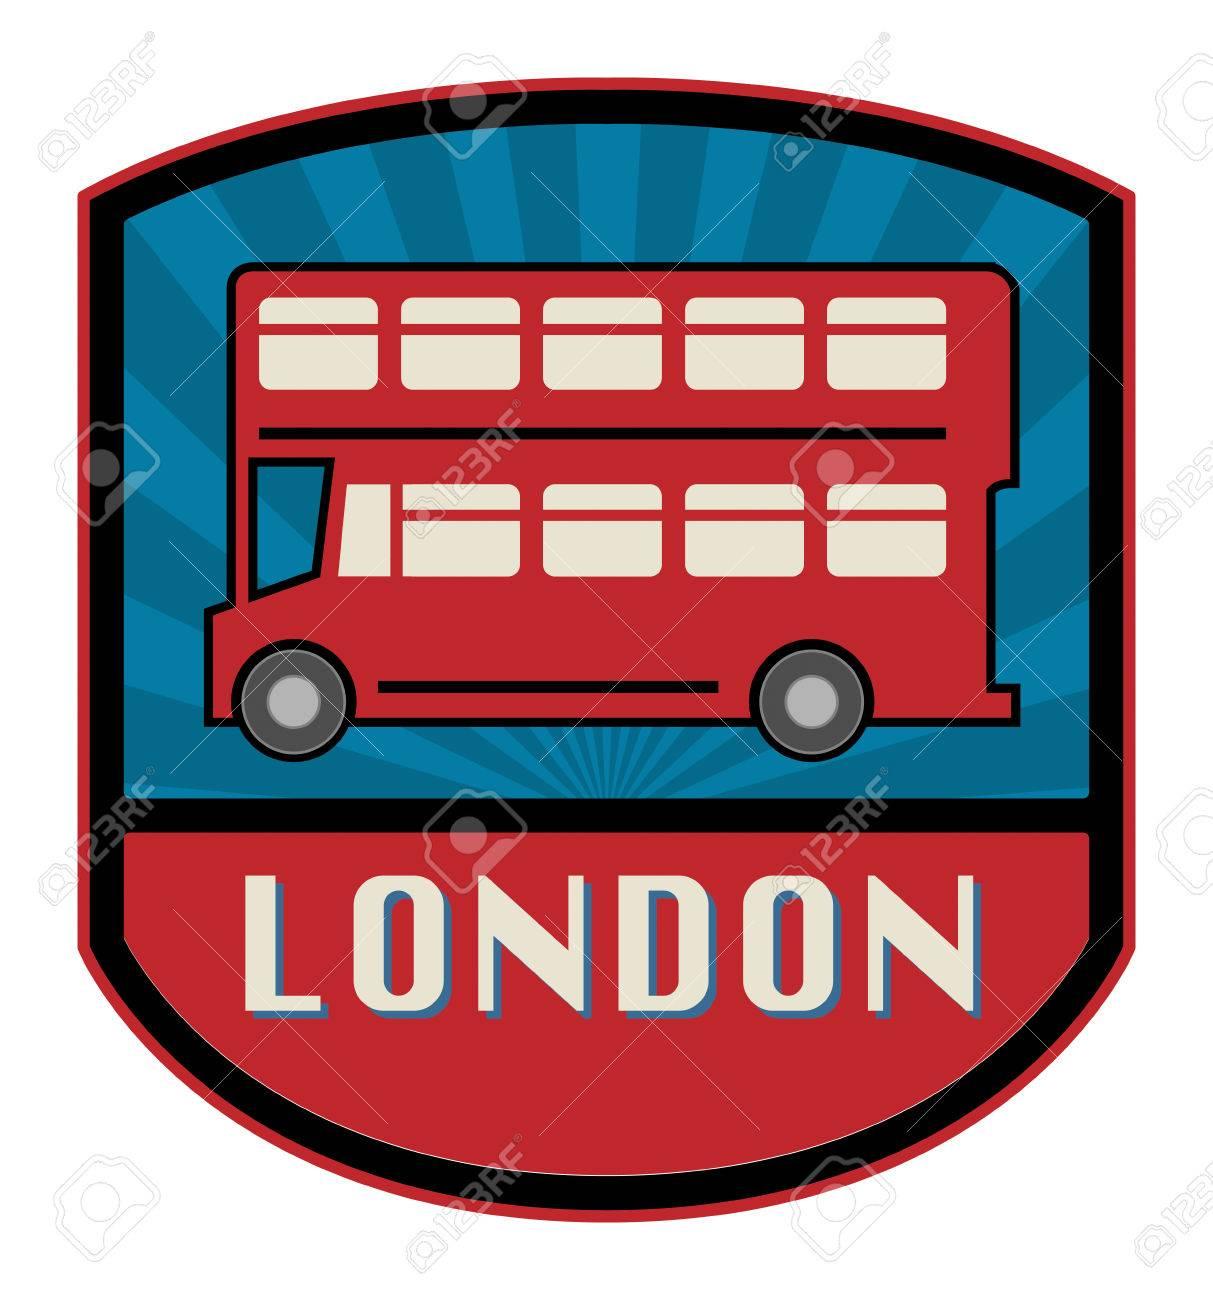 Bus label Stock Vector - 23564518